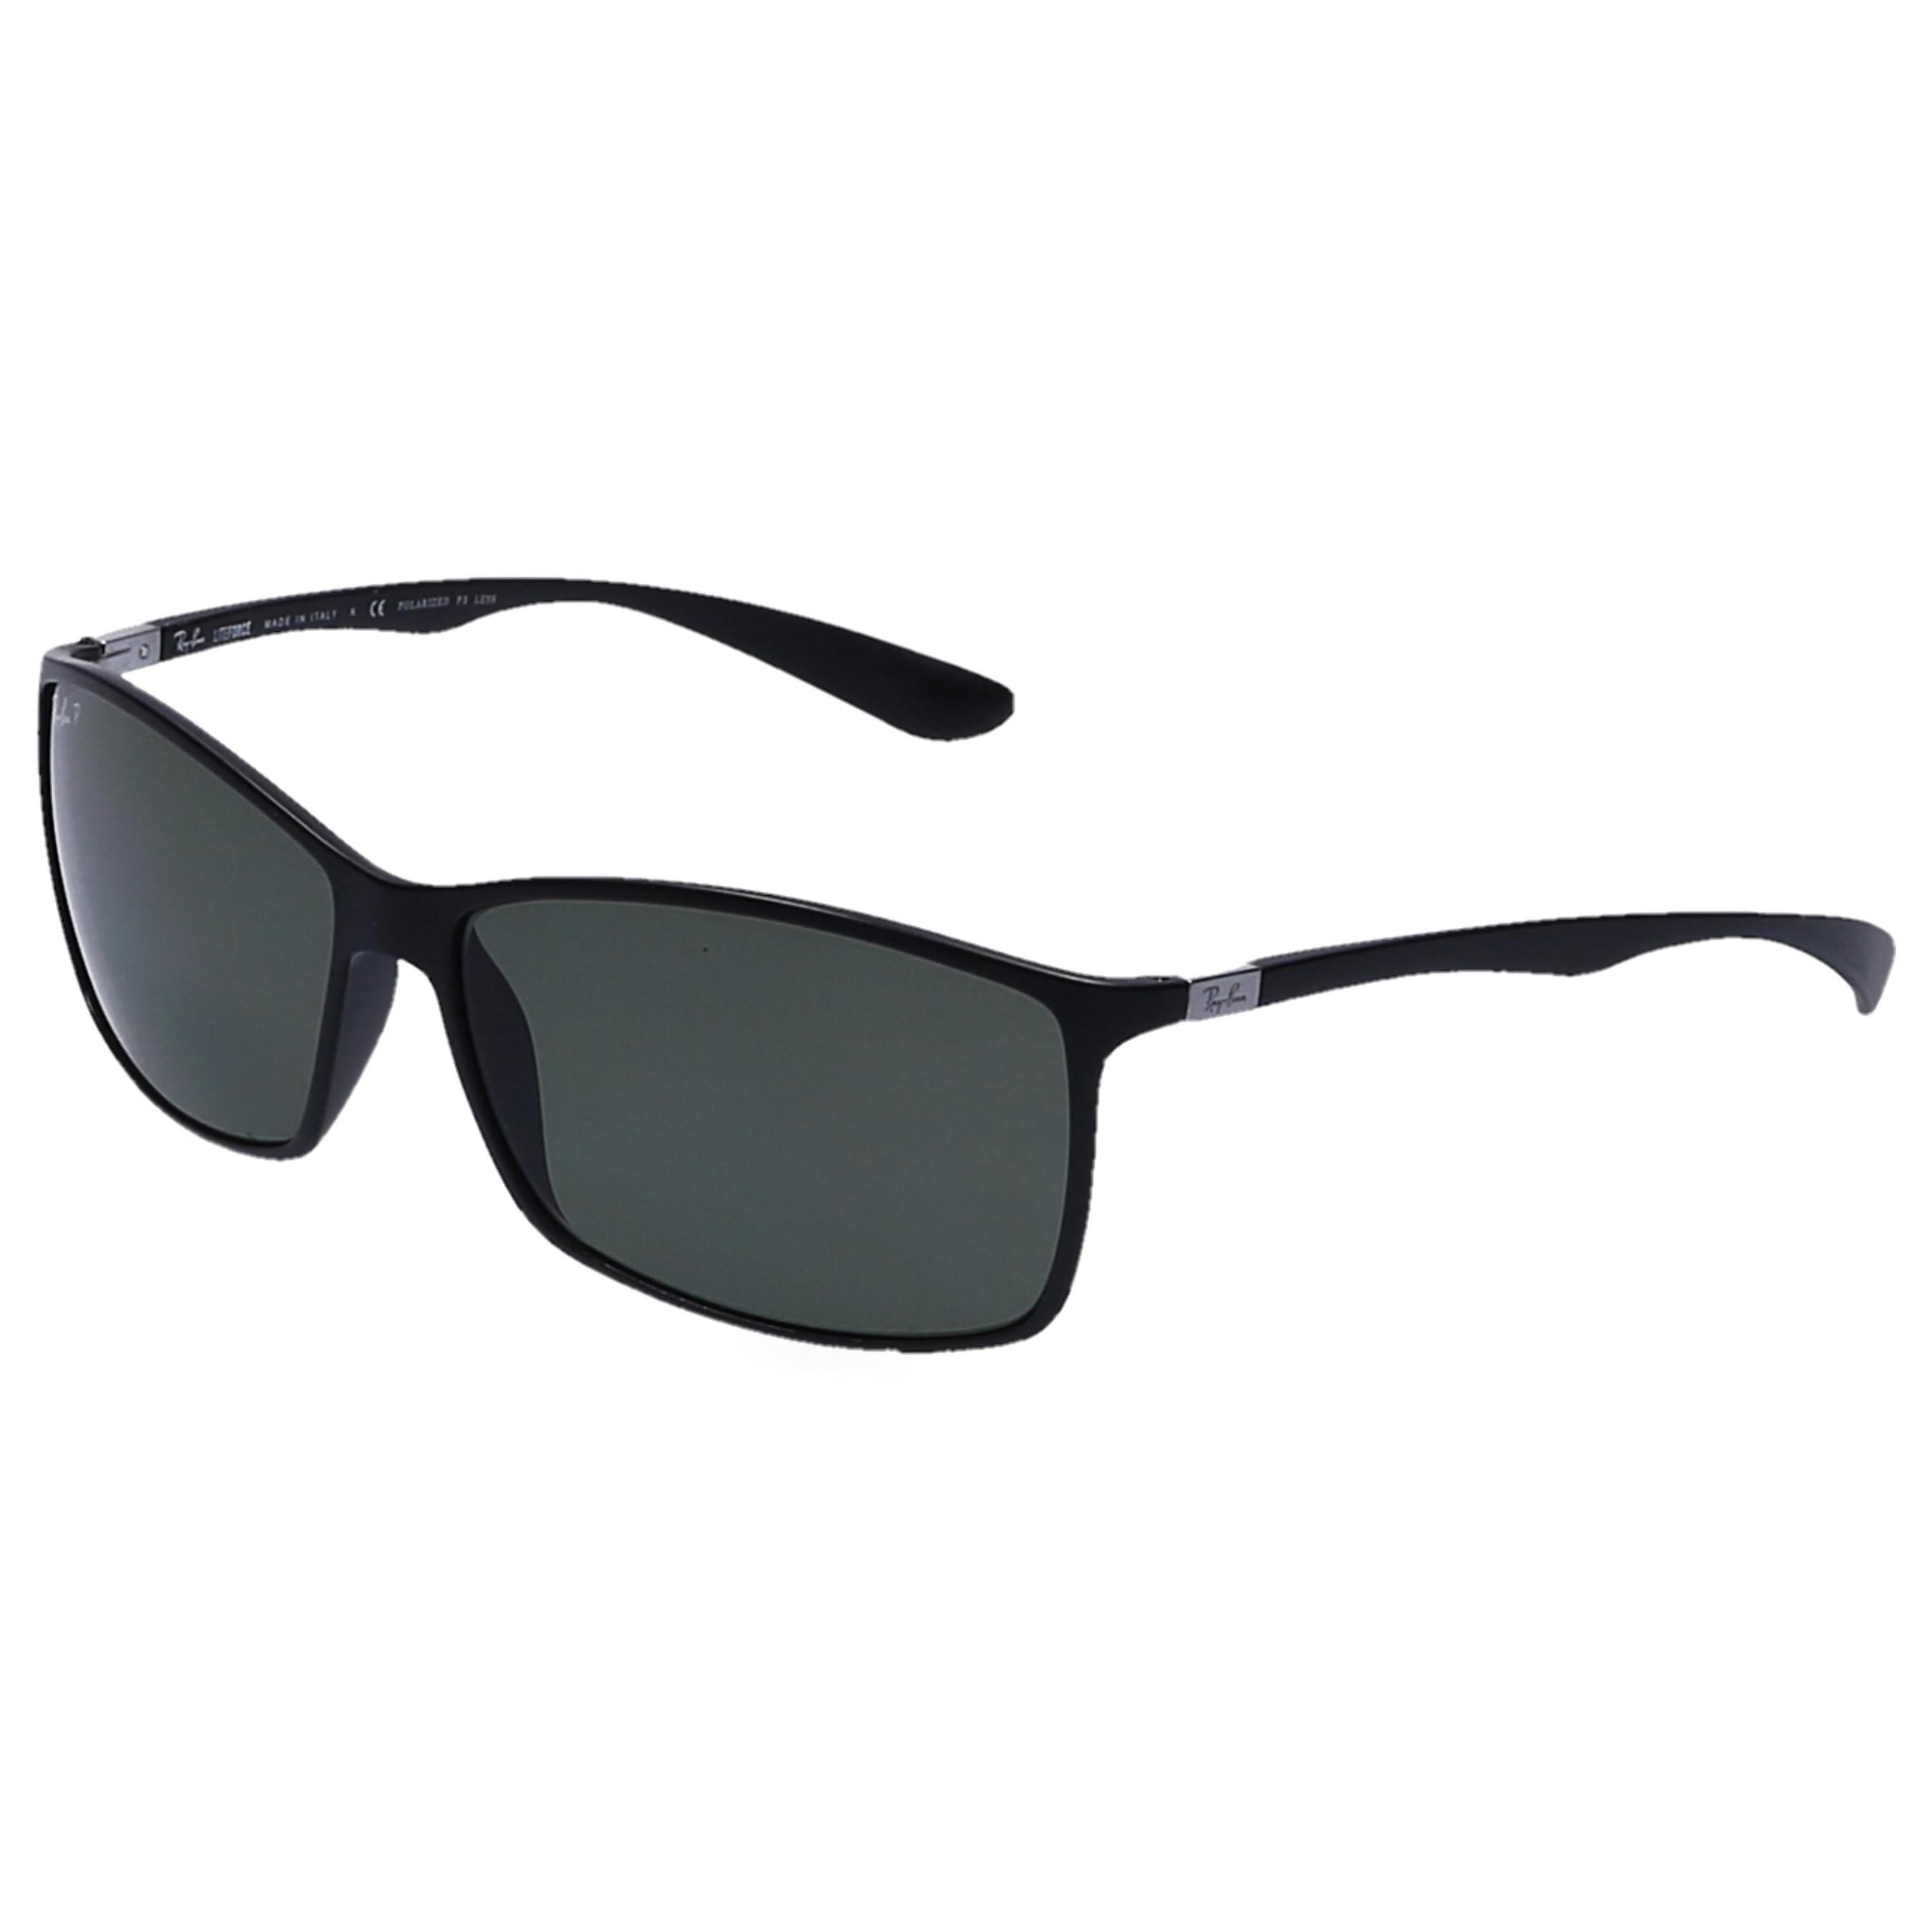 6bb37ff542 Ray-Ban - Sunglasses Wayfarer 4179 Acetate Black for Men - Lyst. View  fullscreen